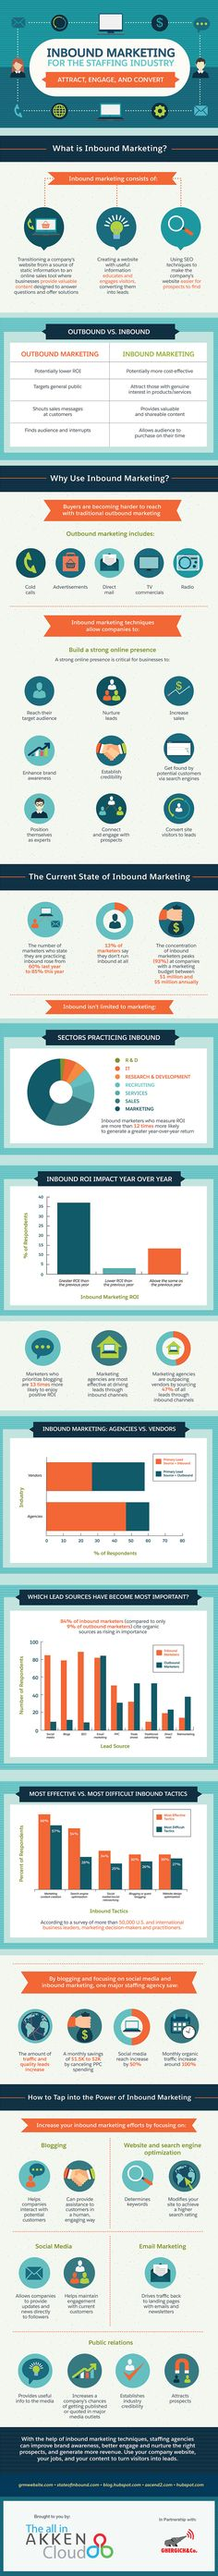 inbound talent marketing #infographic @AkkenCloud